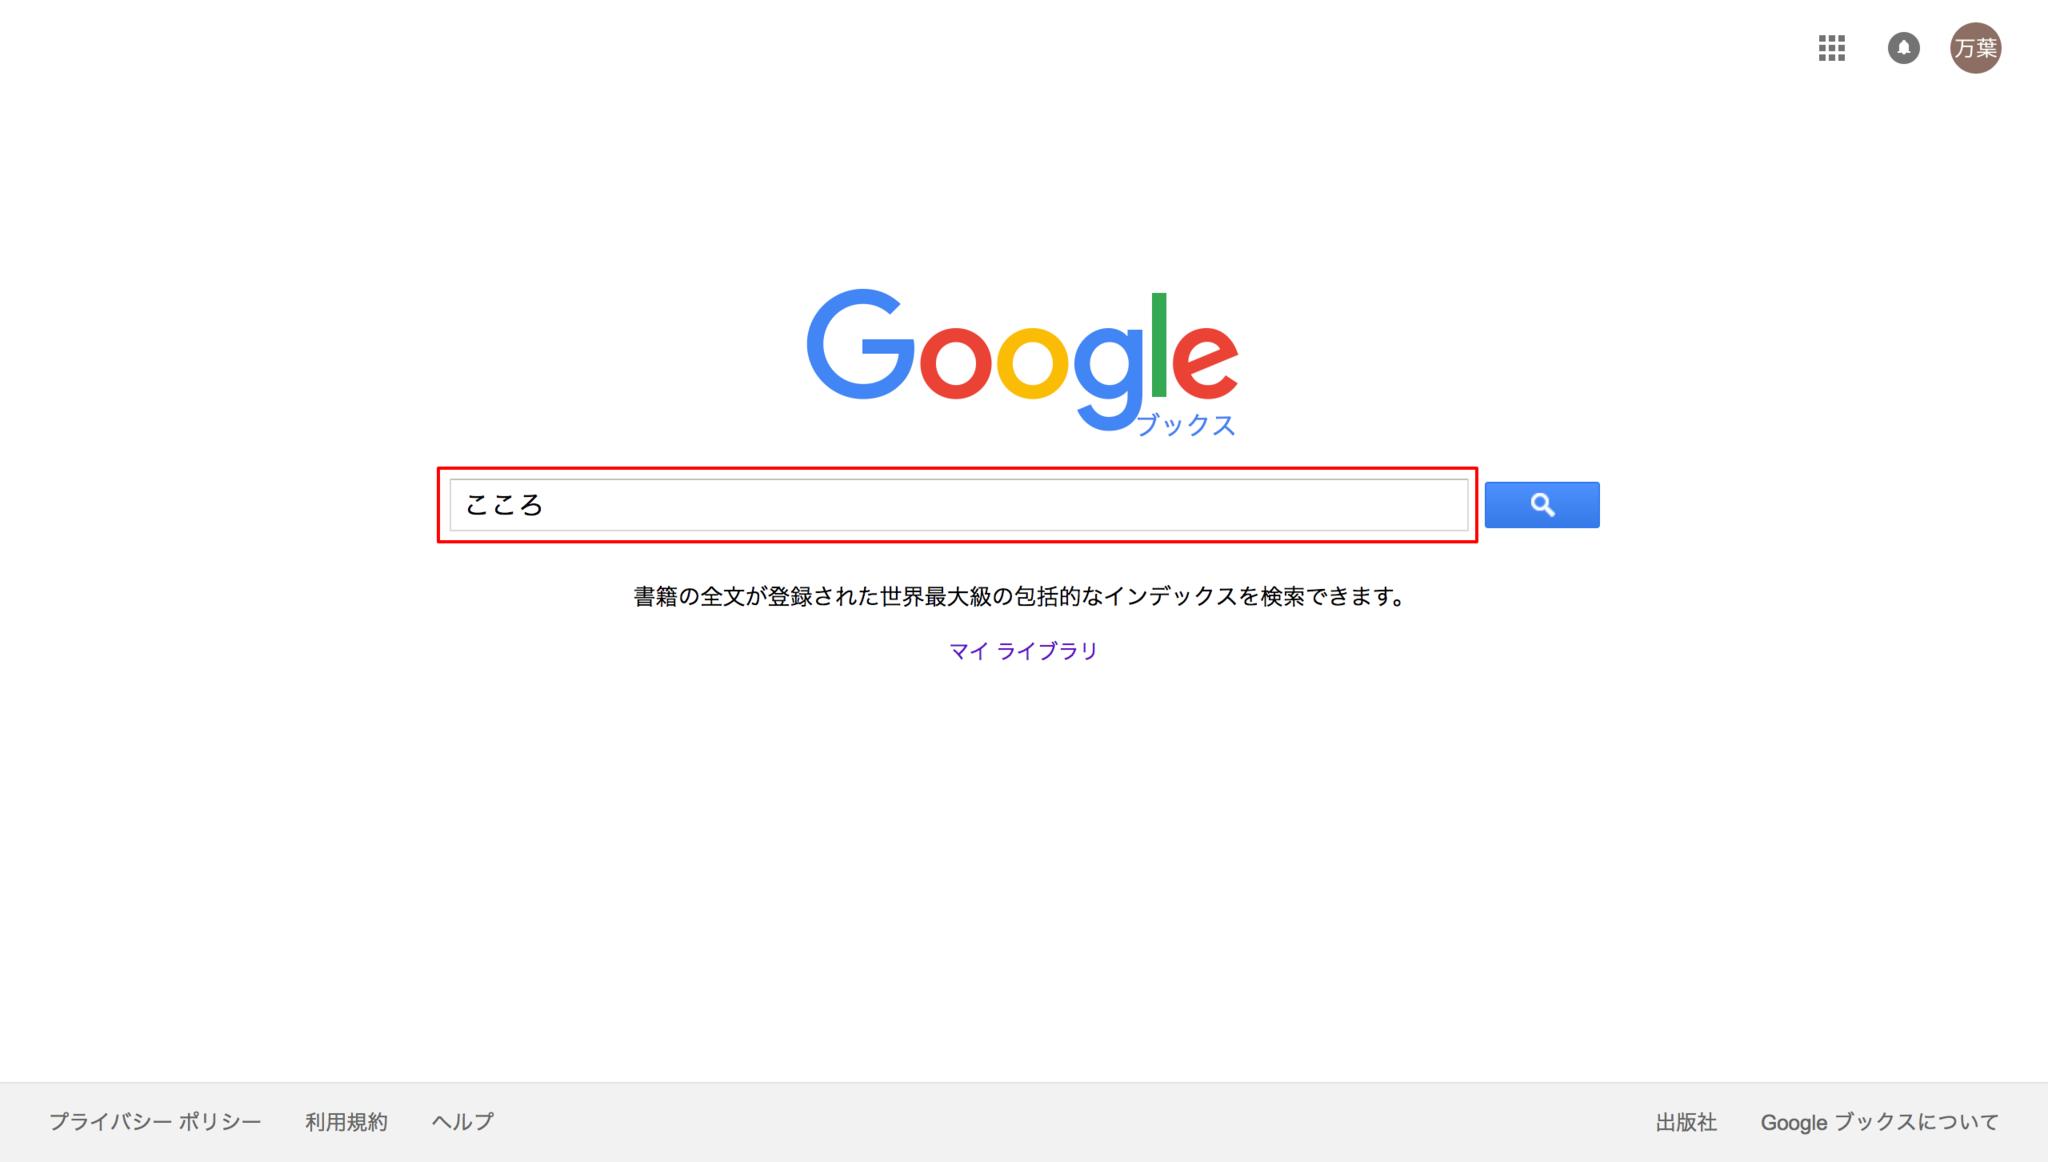 Google_ブックス_(1).png